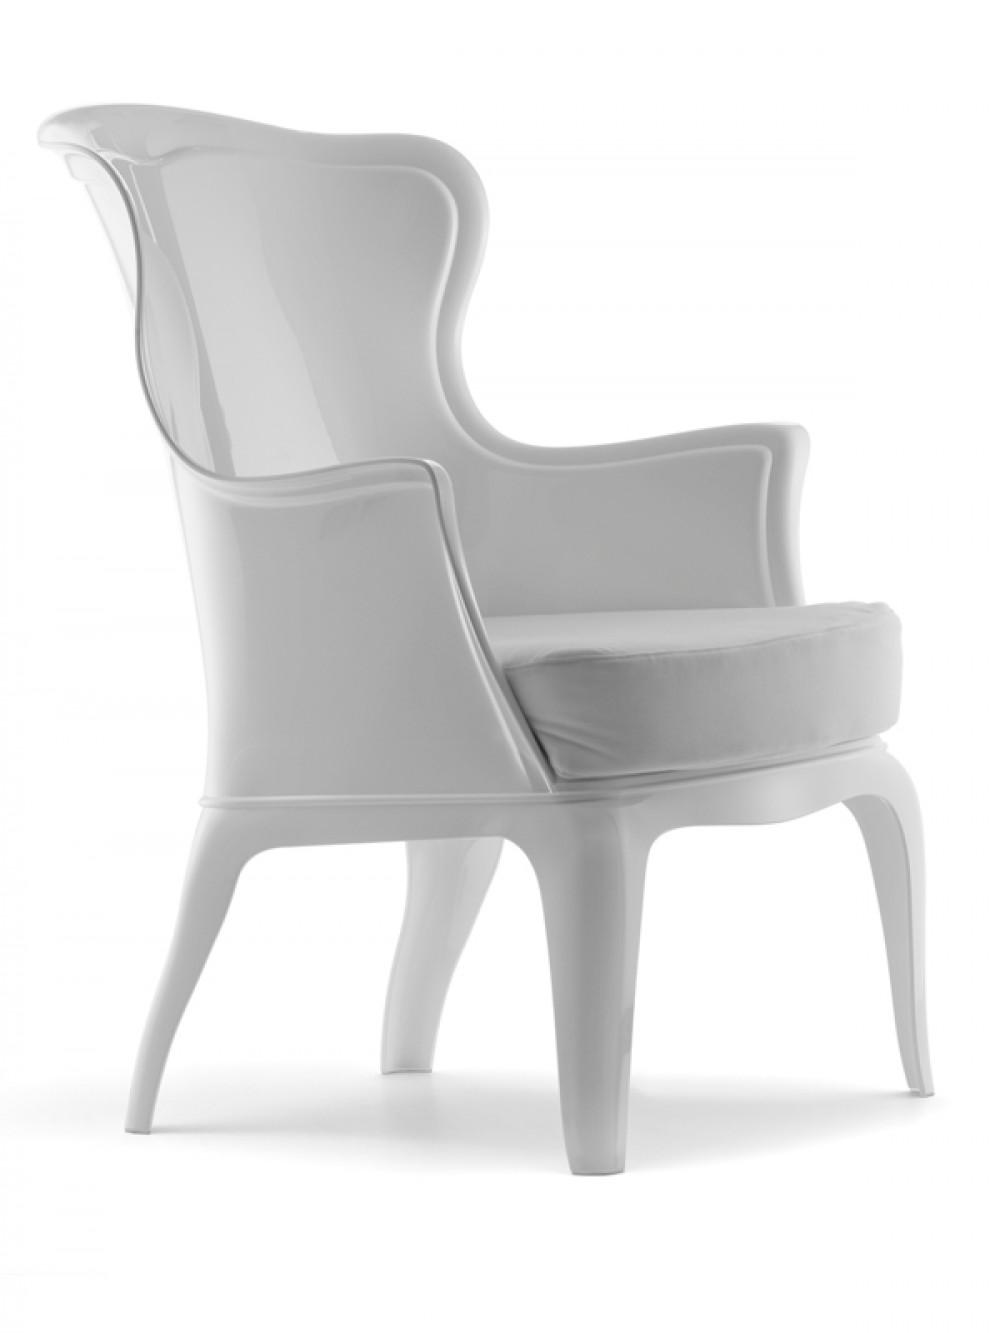 Sessel im modern barockstil italienisches design farbe wei for Sessel italienisches design